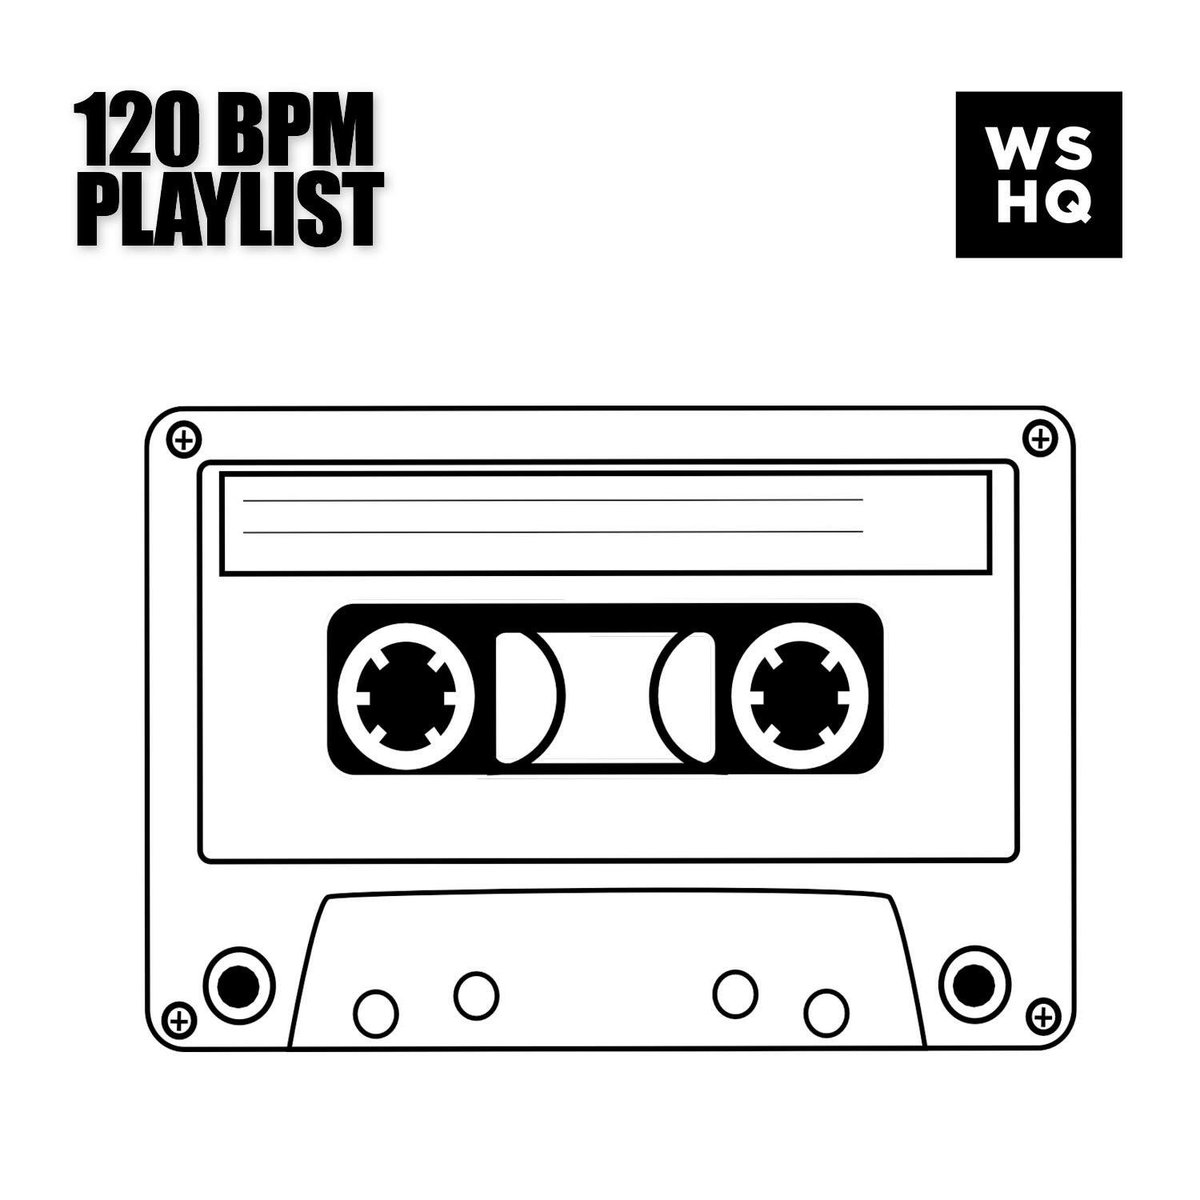 120 Bpm Songs